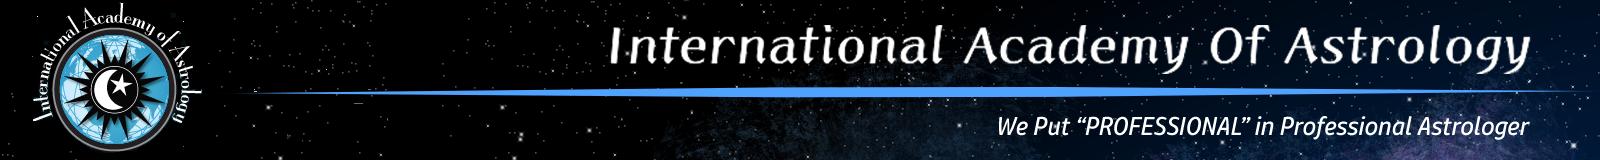 International Academy of Astrology – Learn Astrology Online